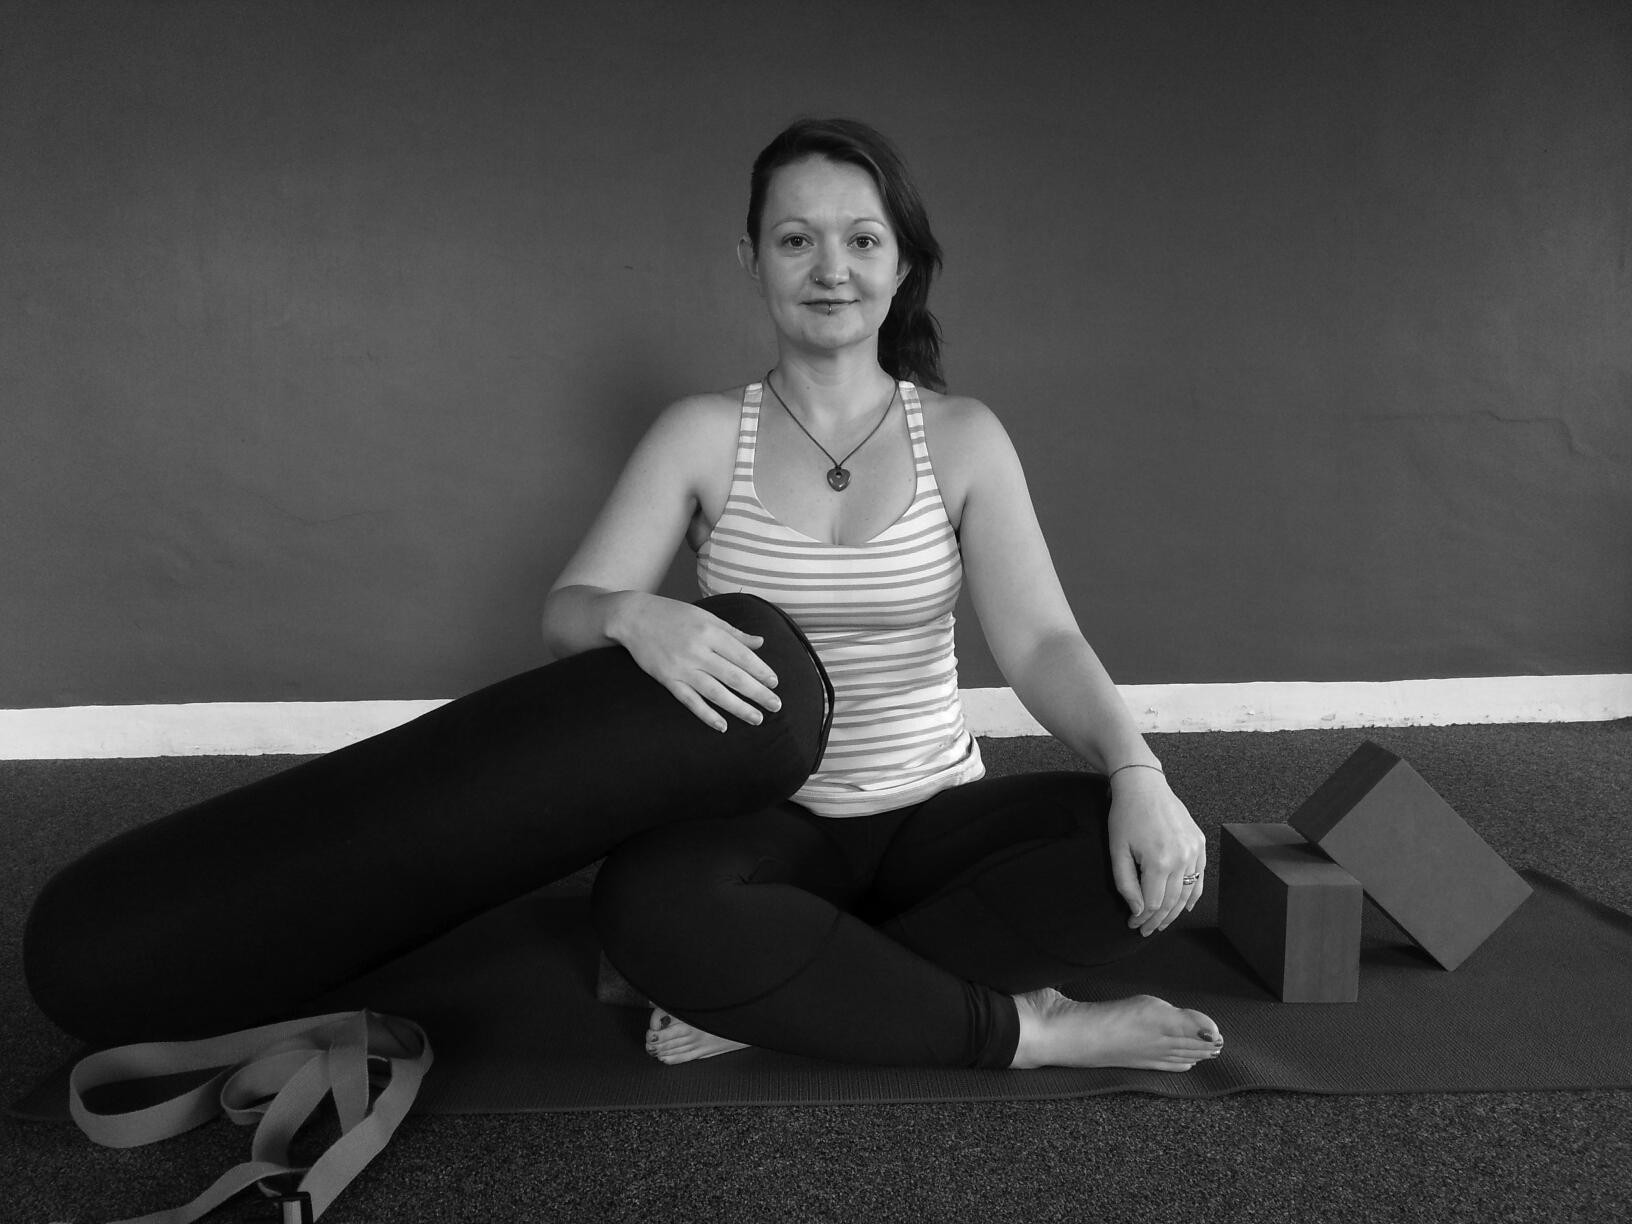 Rachel on yoga mat